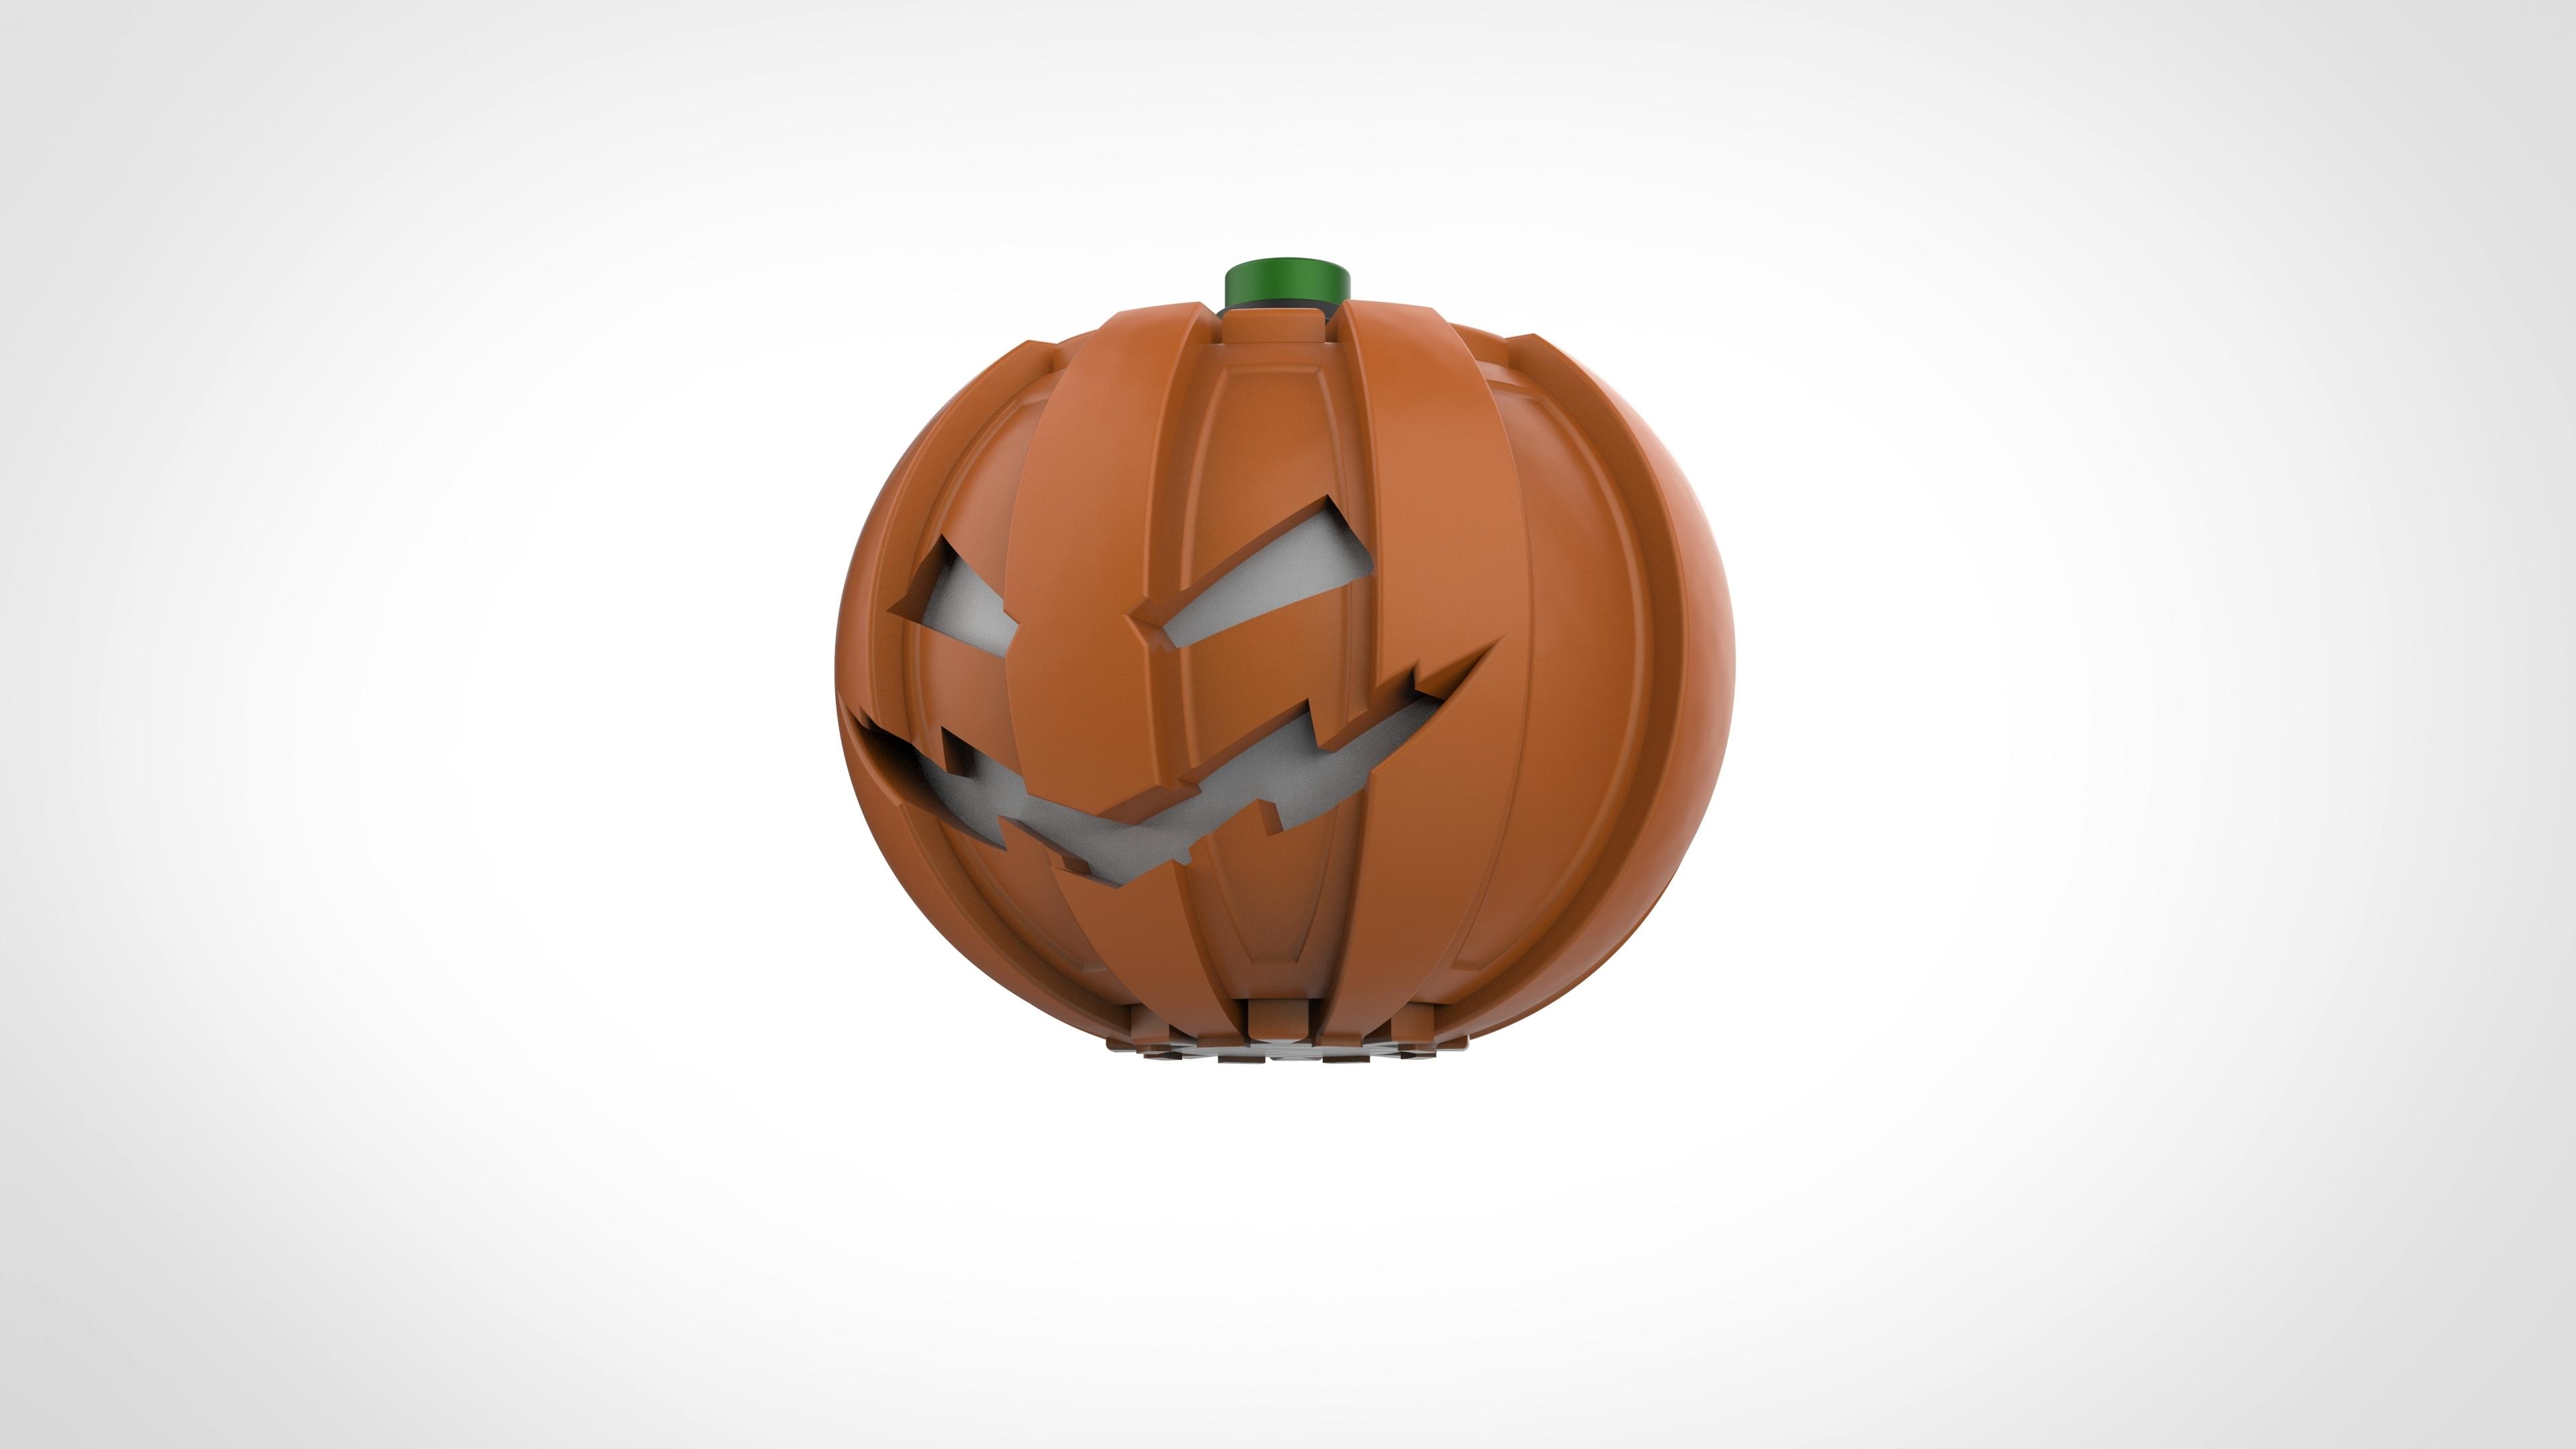 000.jpg Download 3MF file Green goblin bombs from the Spide-Man comics • 3D print model, vetrock